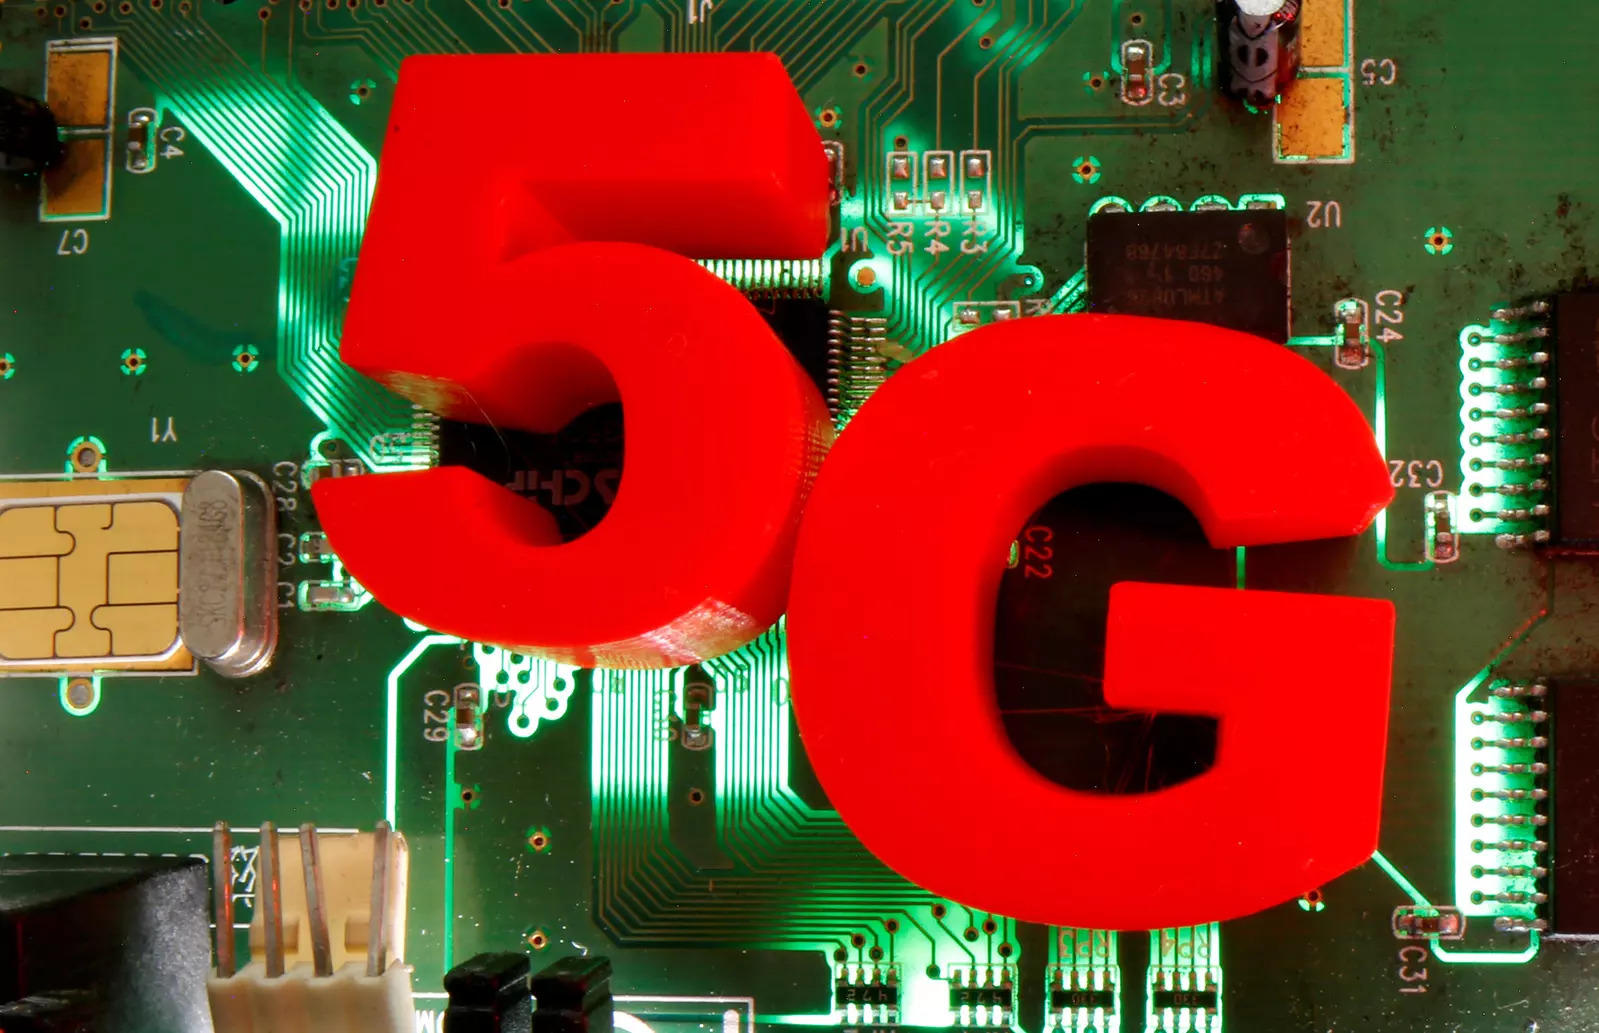 Airtel launches 5G-ready IoT platform to drive enterprise business